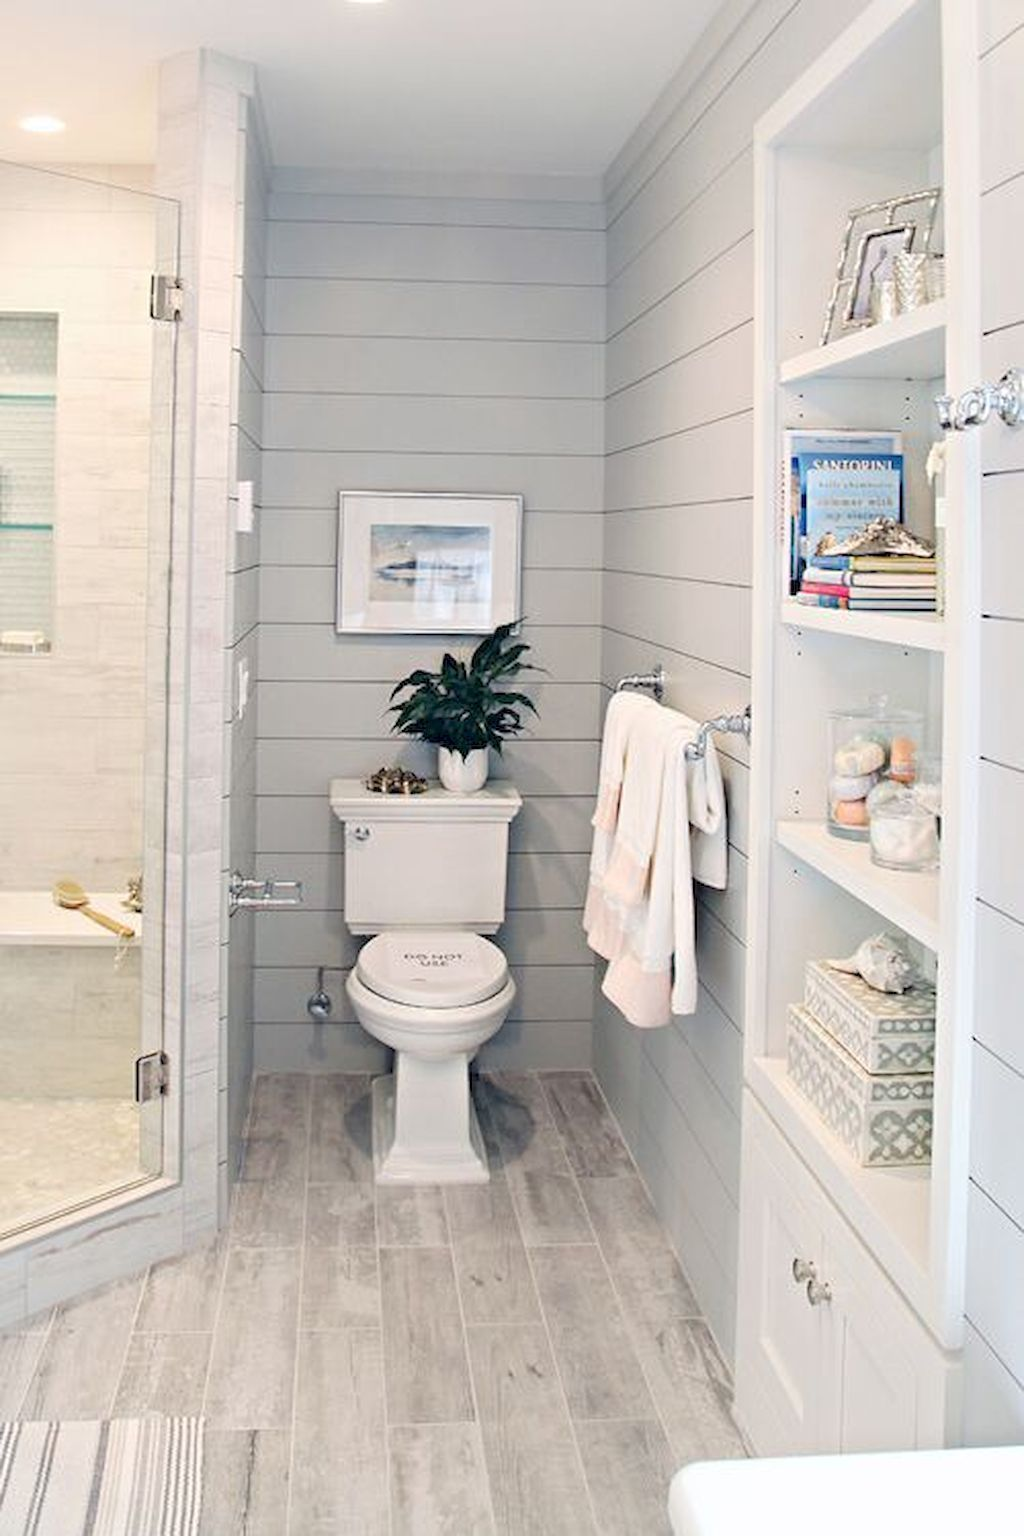 More Ideas Below #bathroomideas Bathroomremodel #bathroom Classy Pictures Of Small Bathroom Makeovers Review